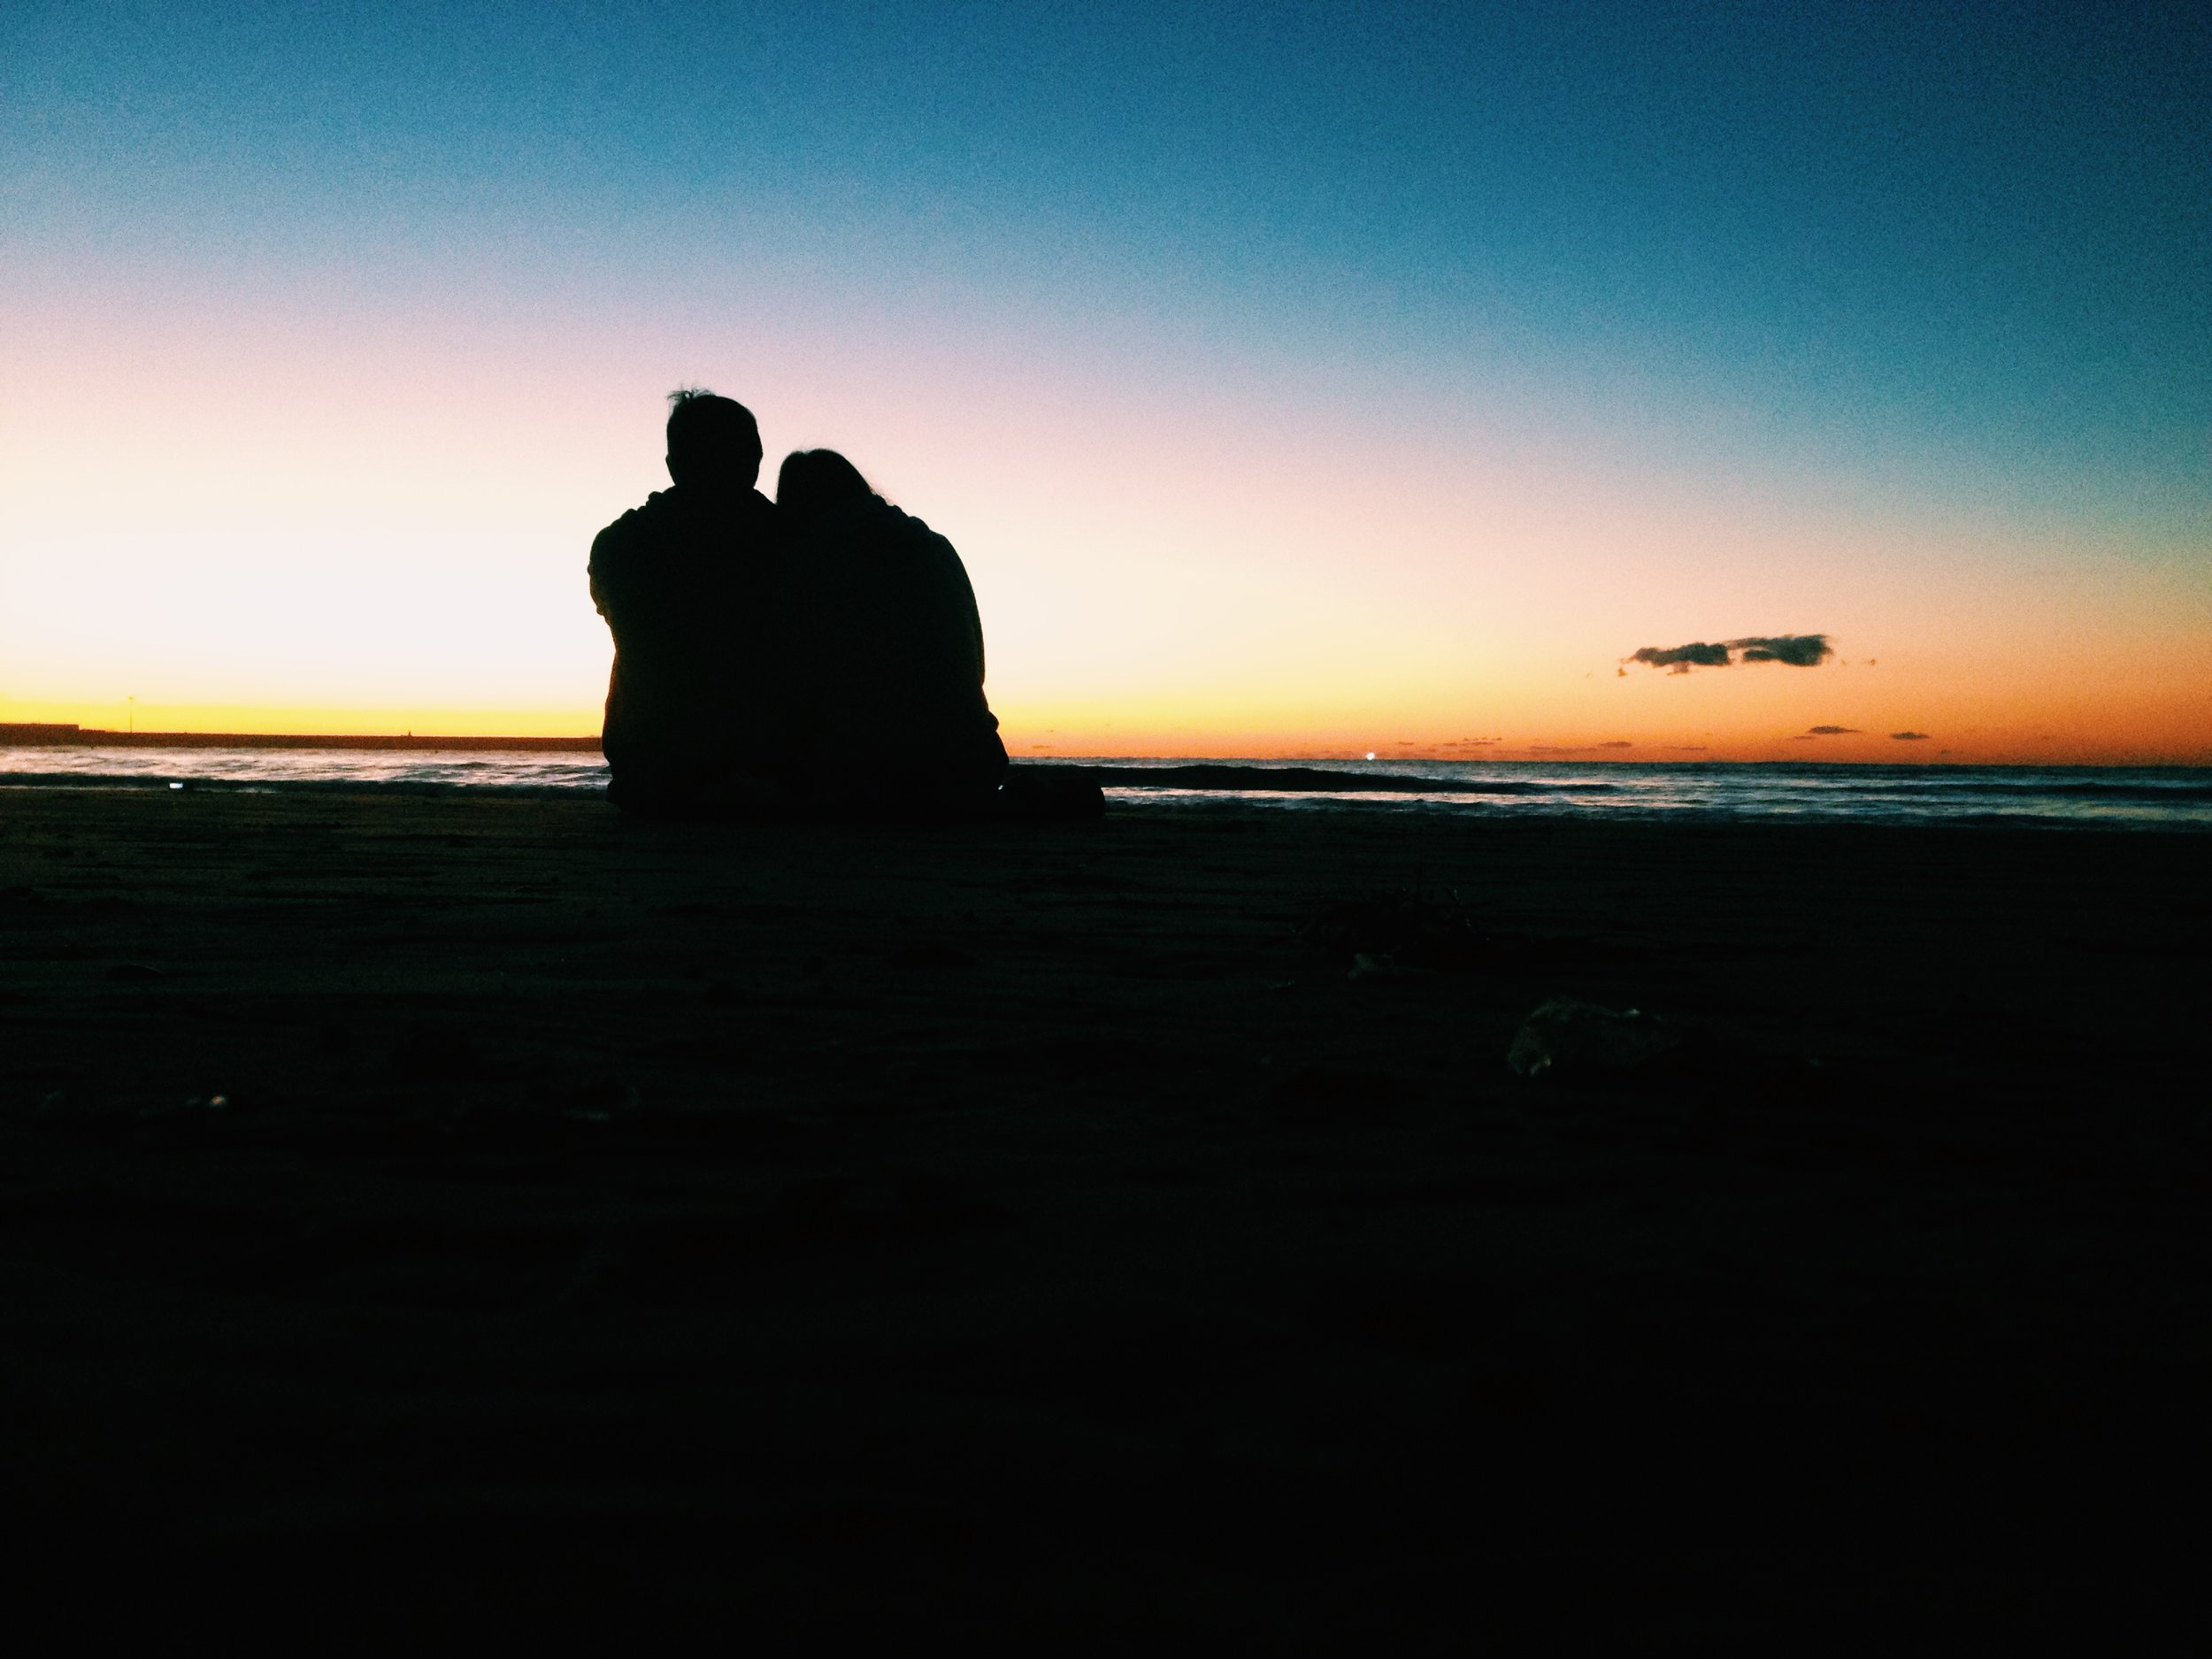 vlogging couple